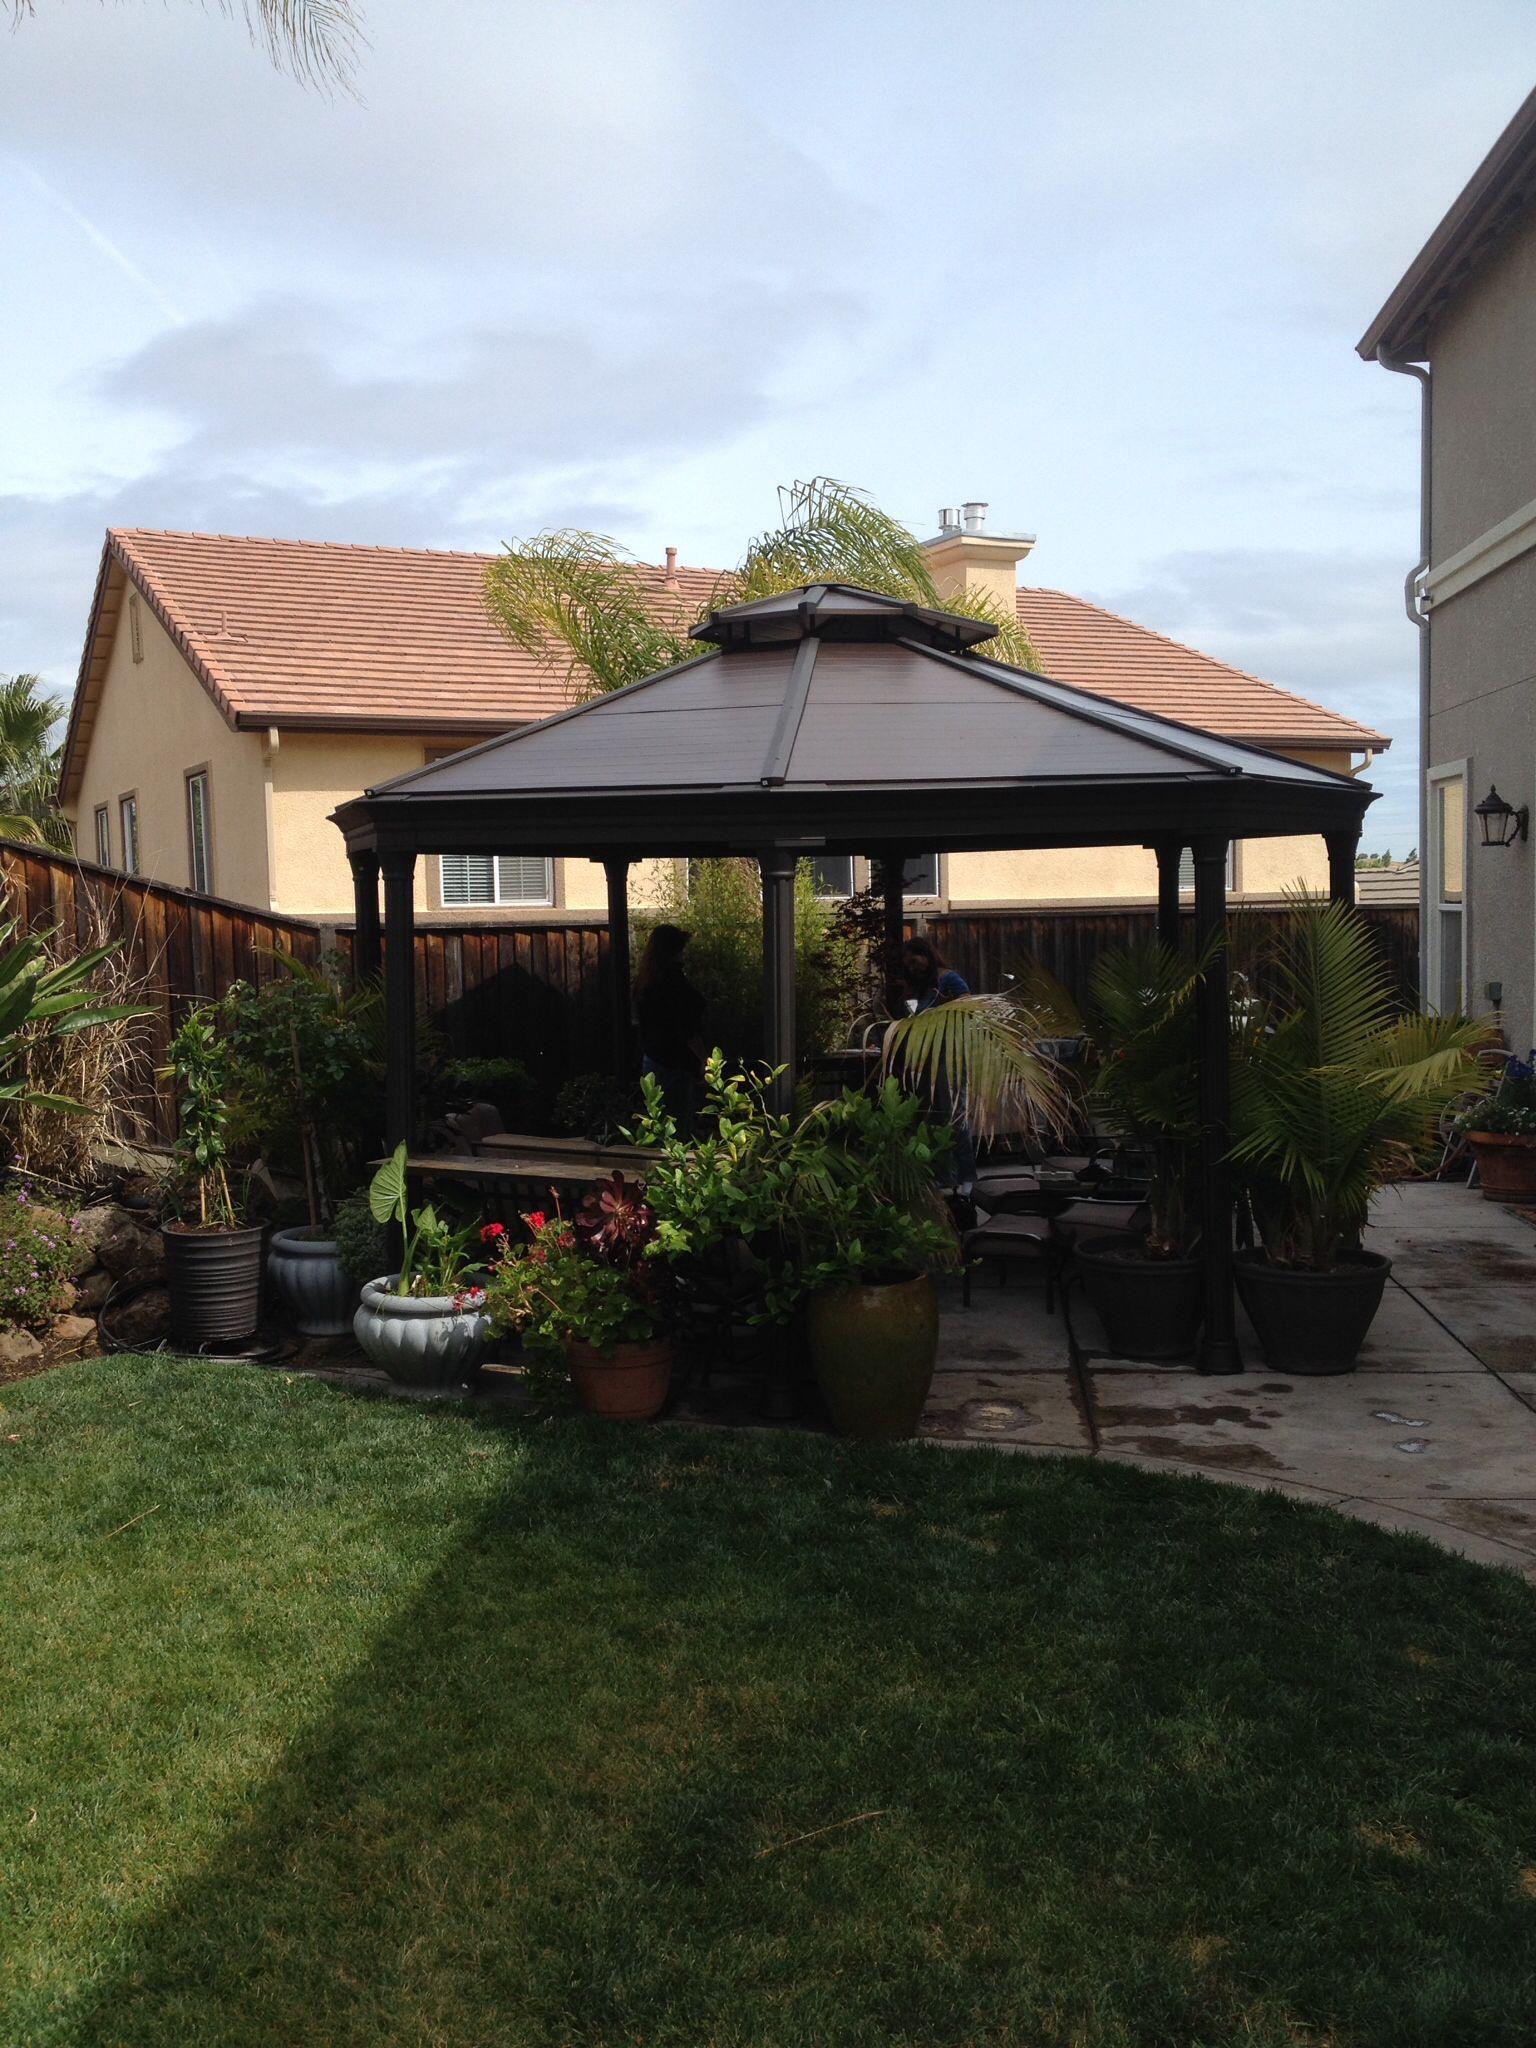 Costco Gazebo in my garden in 2019 | Backyard, Portable ... on Backyard Pavilion Costco id=46063